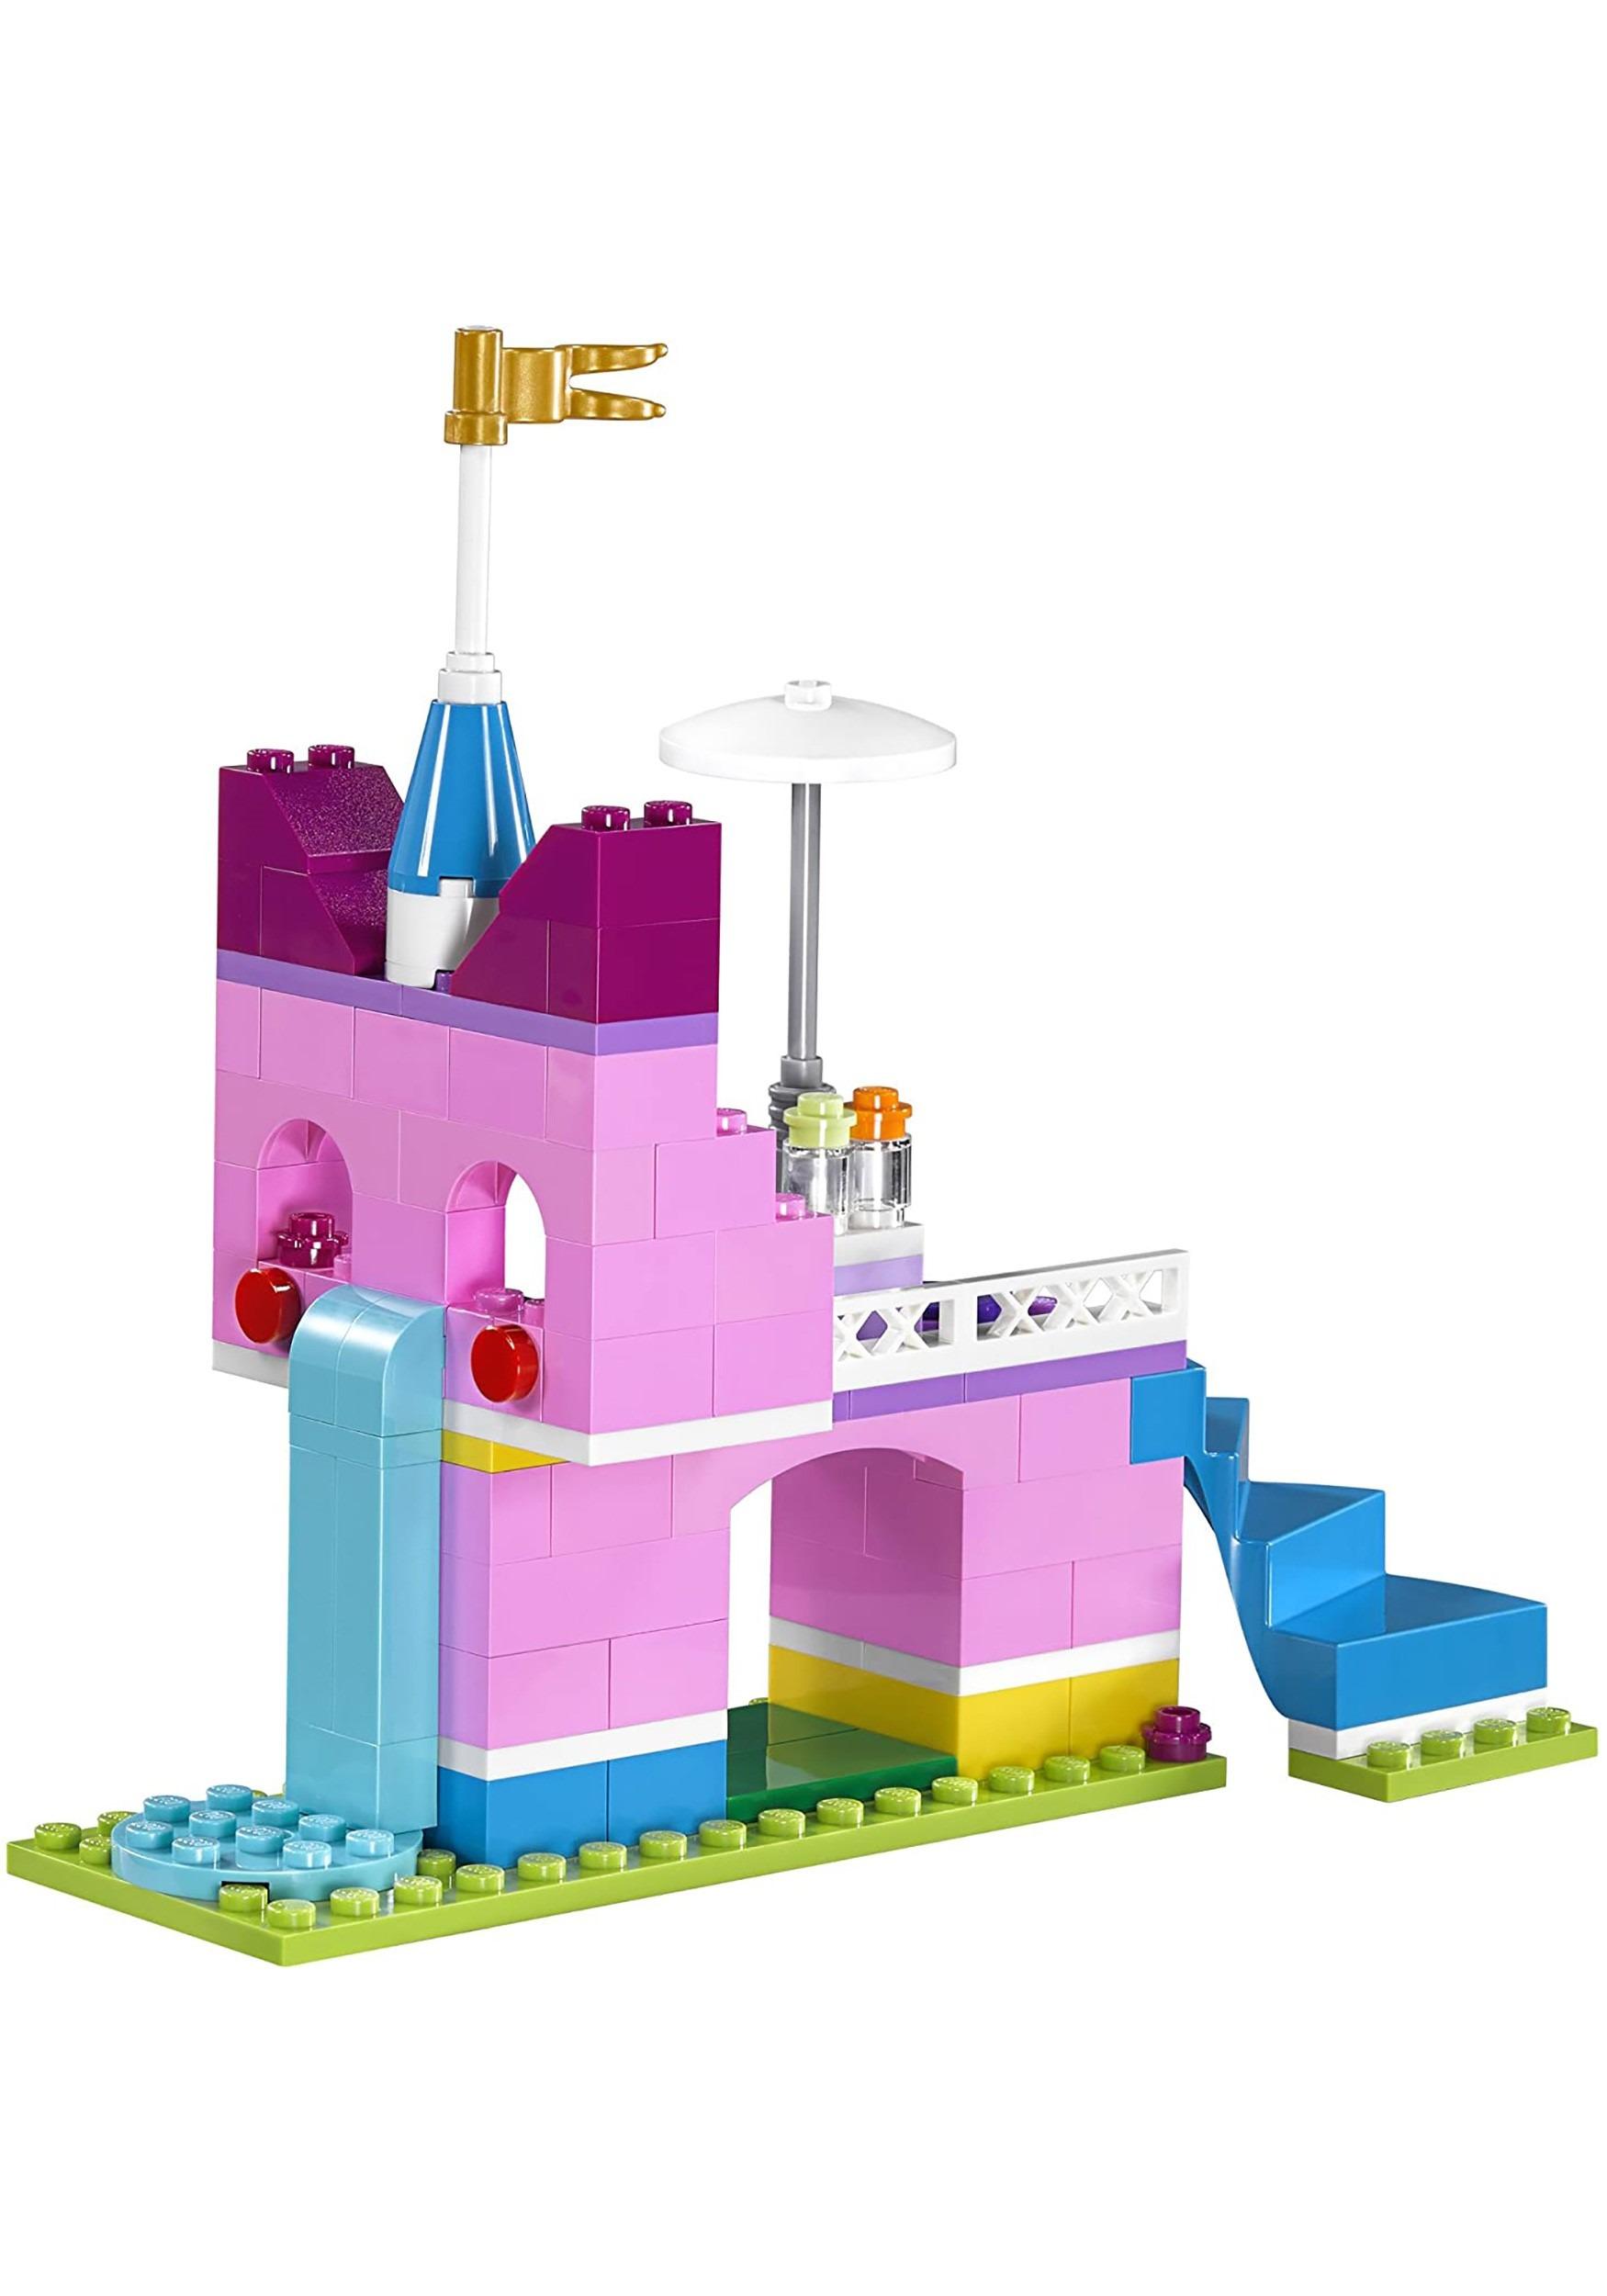 Unikitty Unikingdom Lego Creative Box